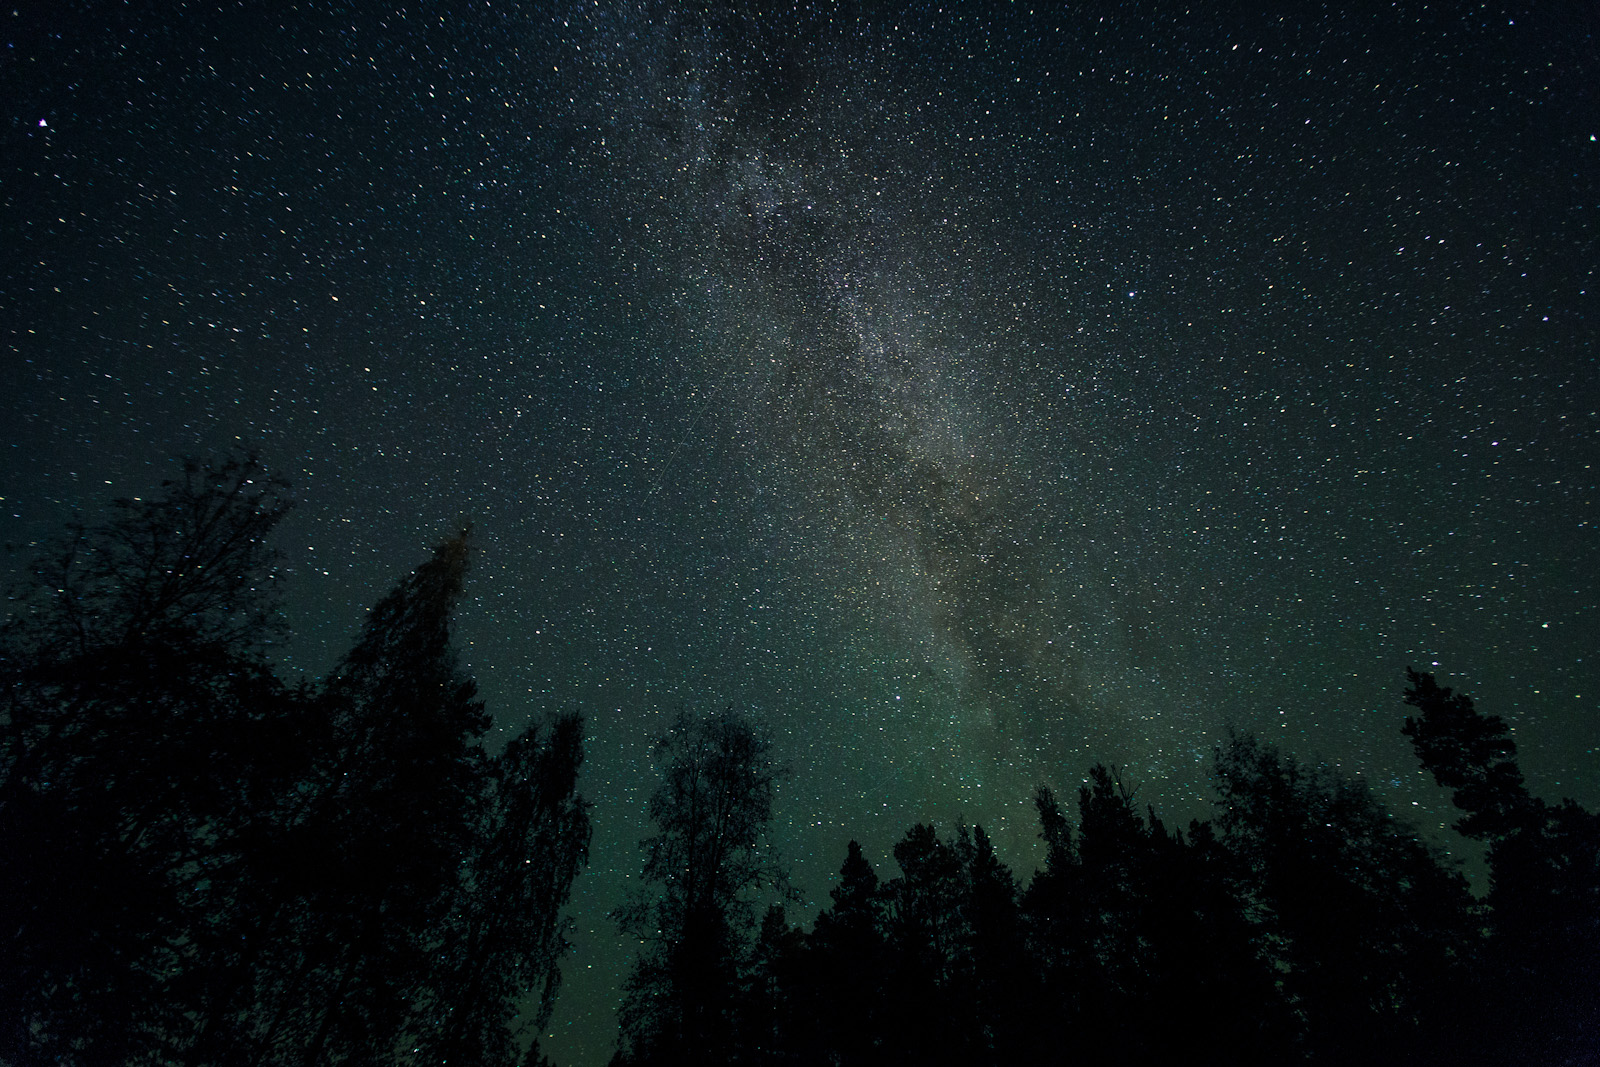 Galaxy Stars Milky Way Night Trees space wallpaper wallpaperupcom 1600x1067